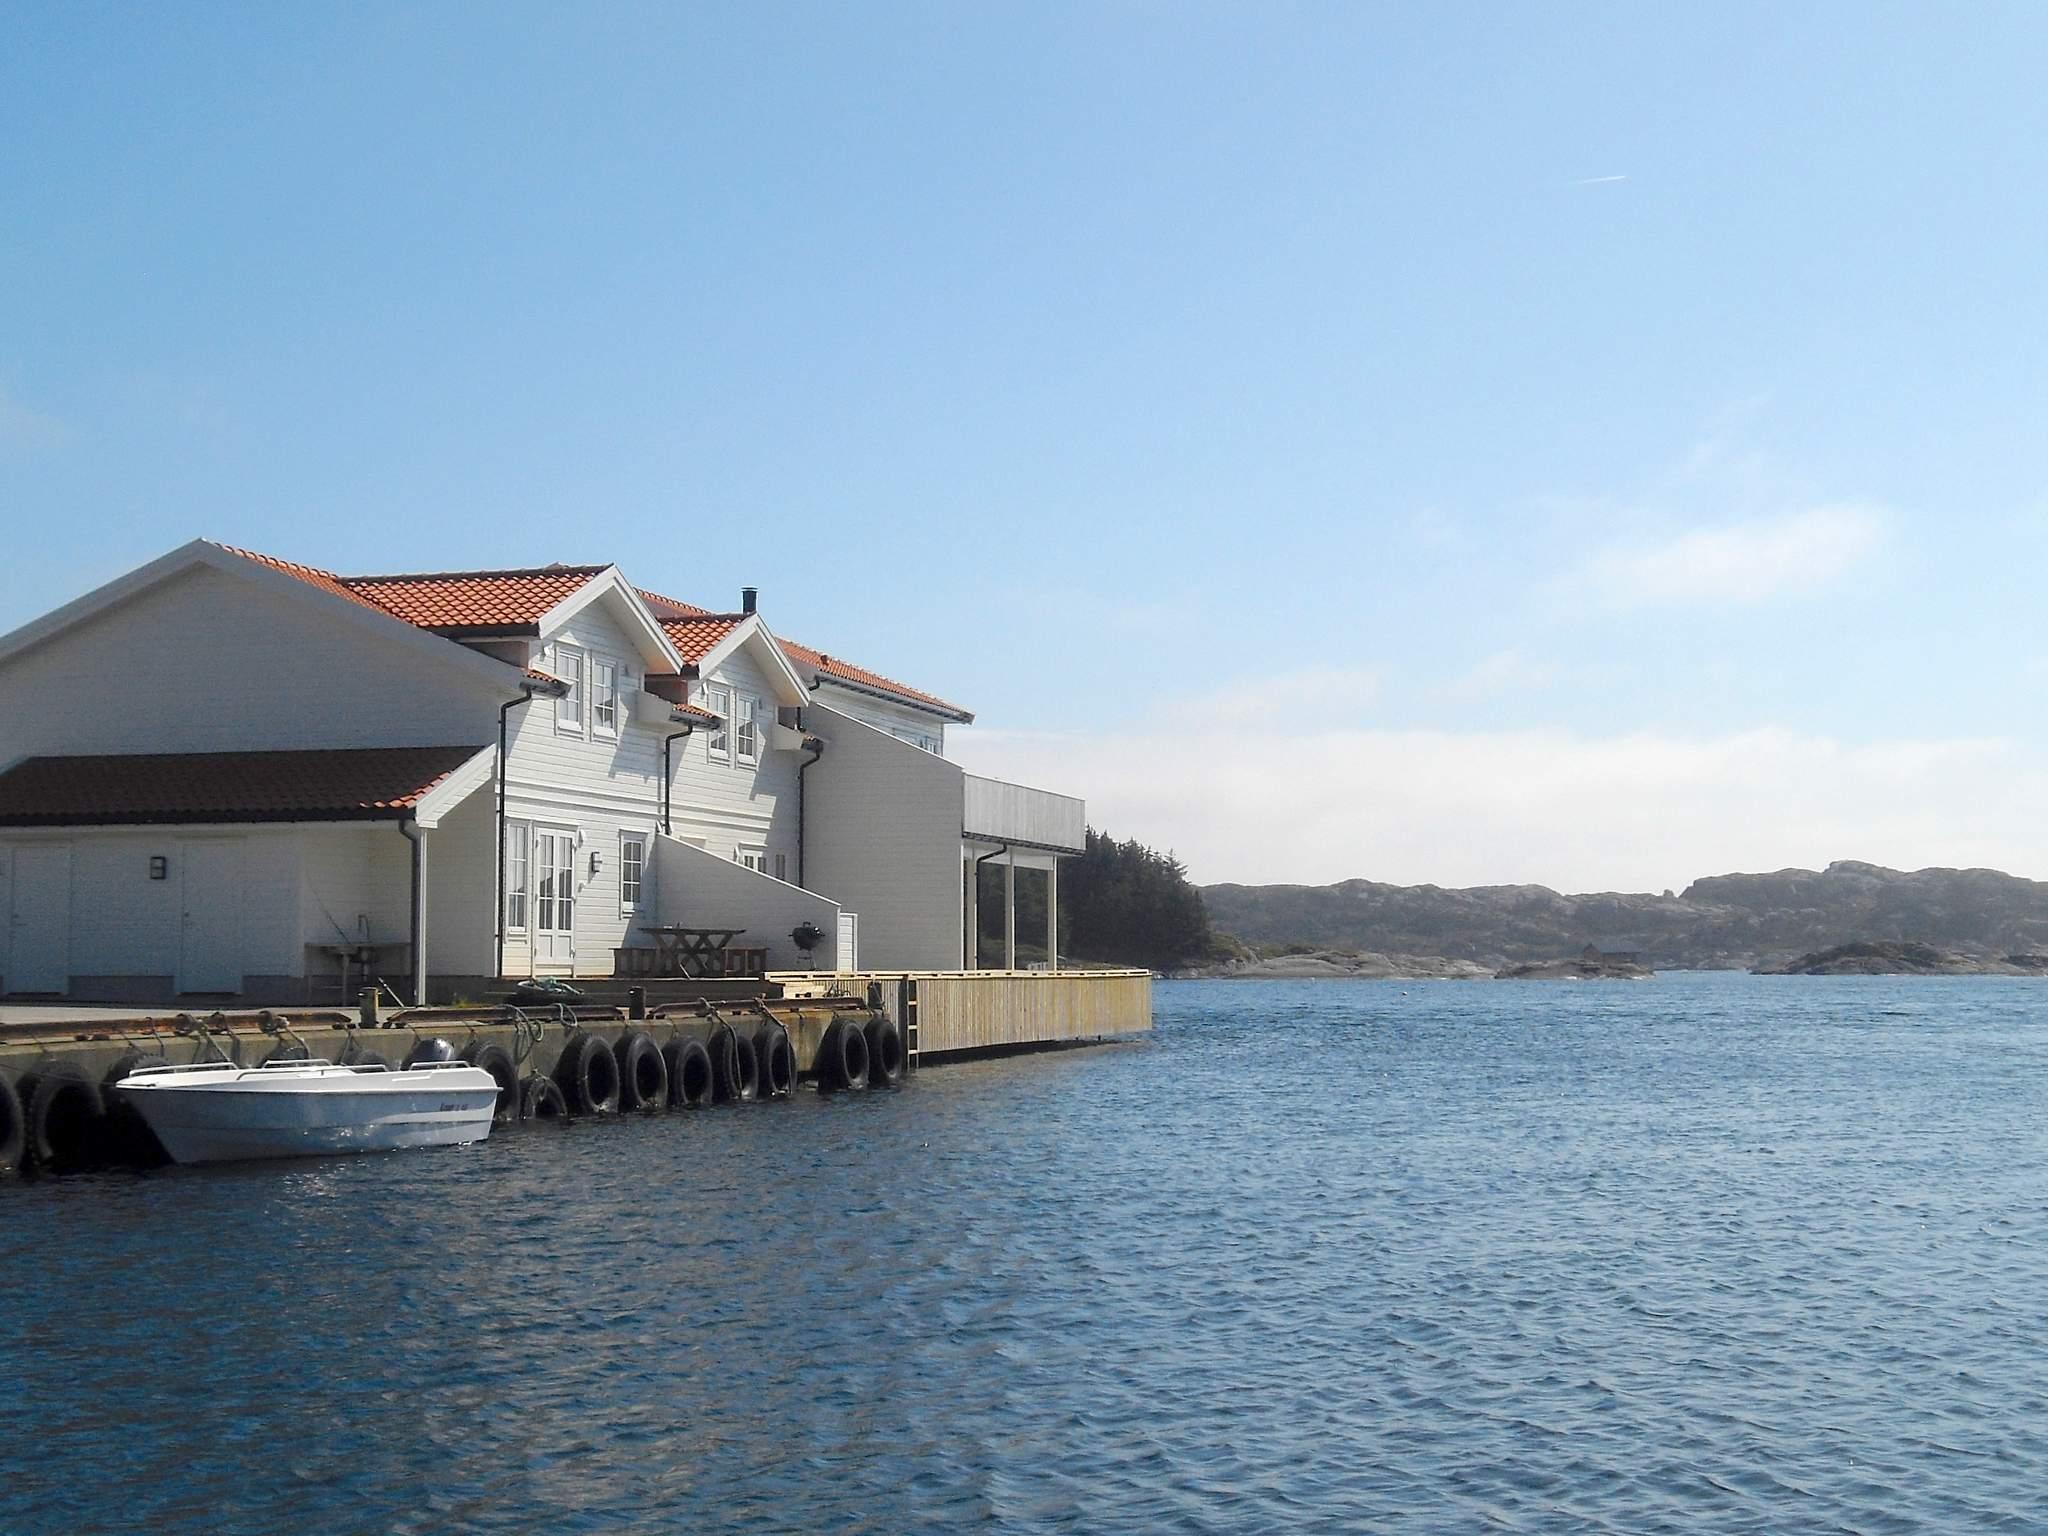 Ferienhaus Mølstrevåg (365130), Sveio, Hordaland - Hardangerfjord, Westnorwegen, Norwegen, Bild 1